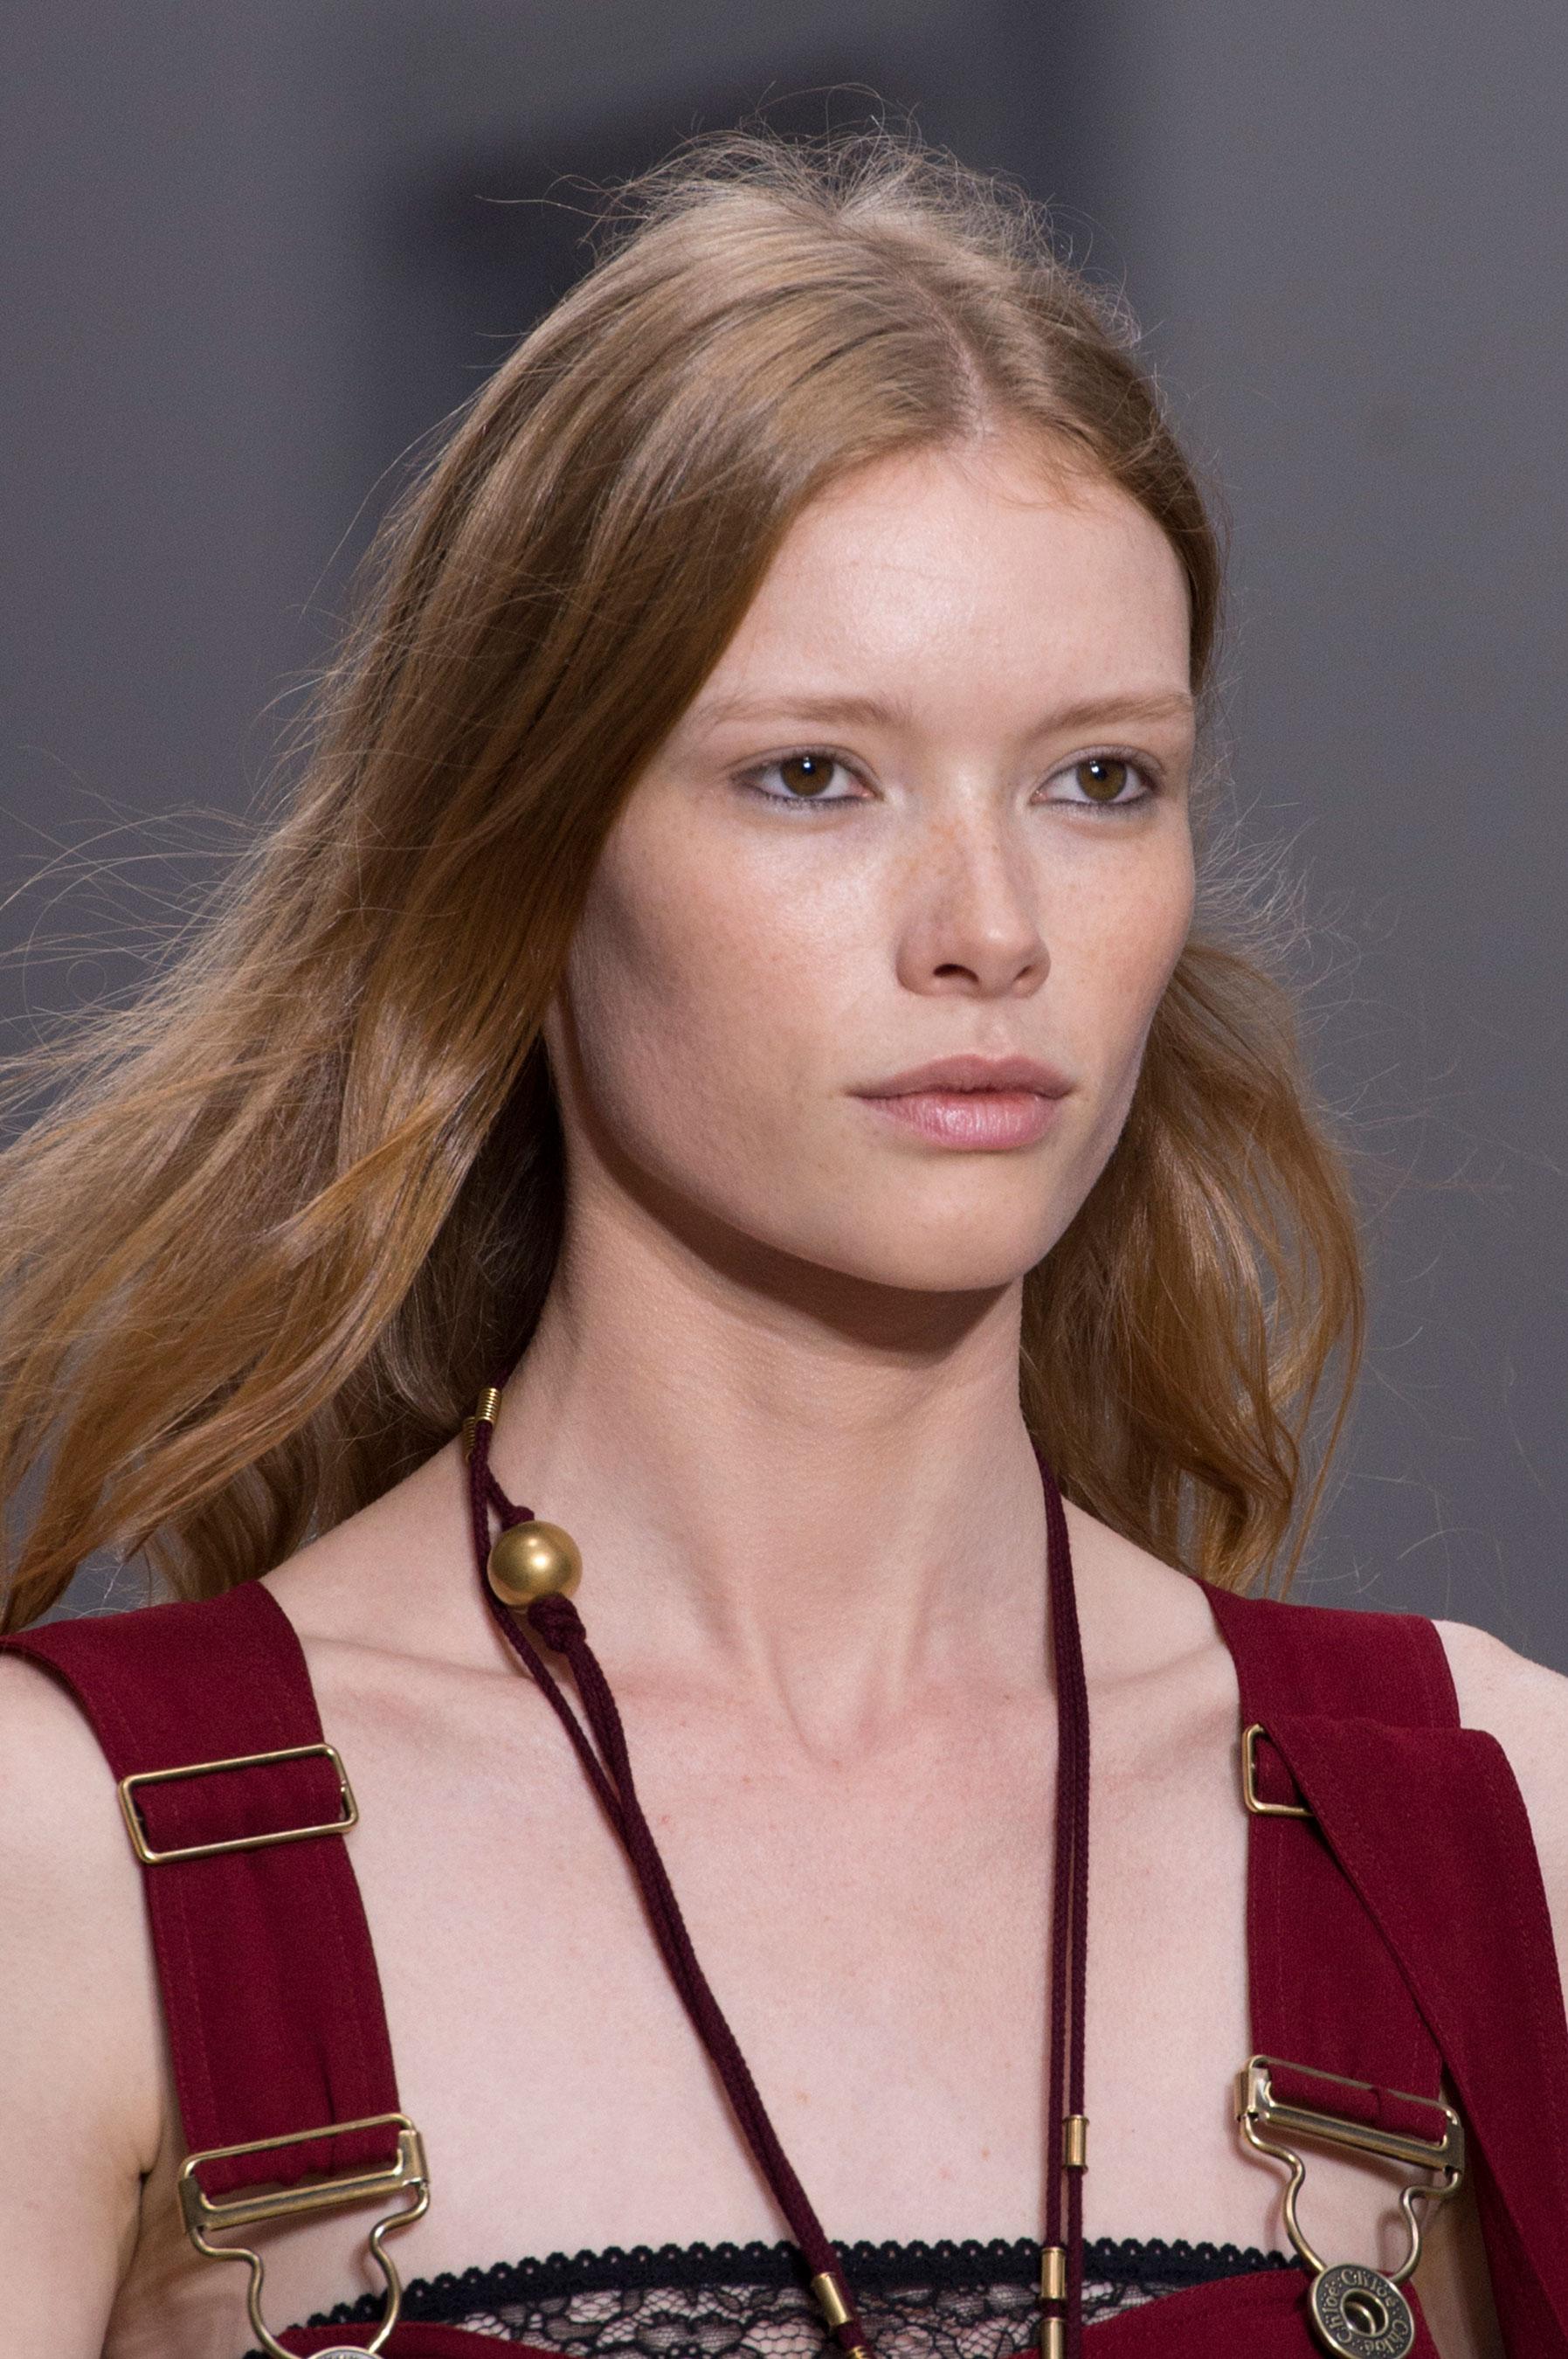 Chloe-spring-2016-runway-beauty-fashion-show-the-impression-19